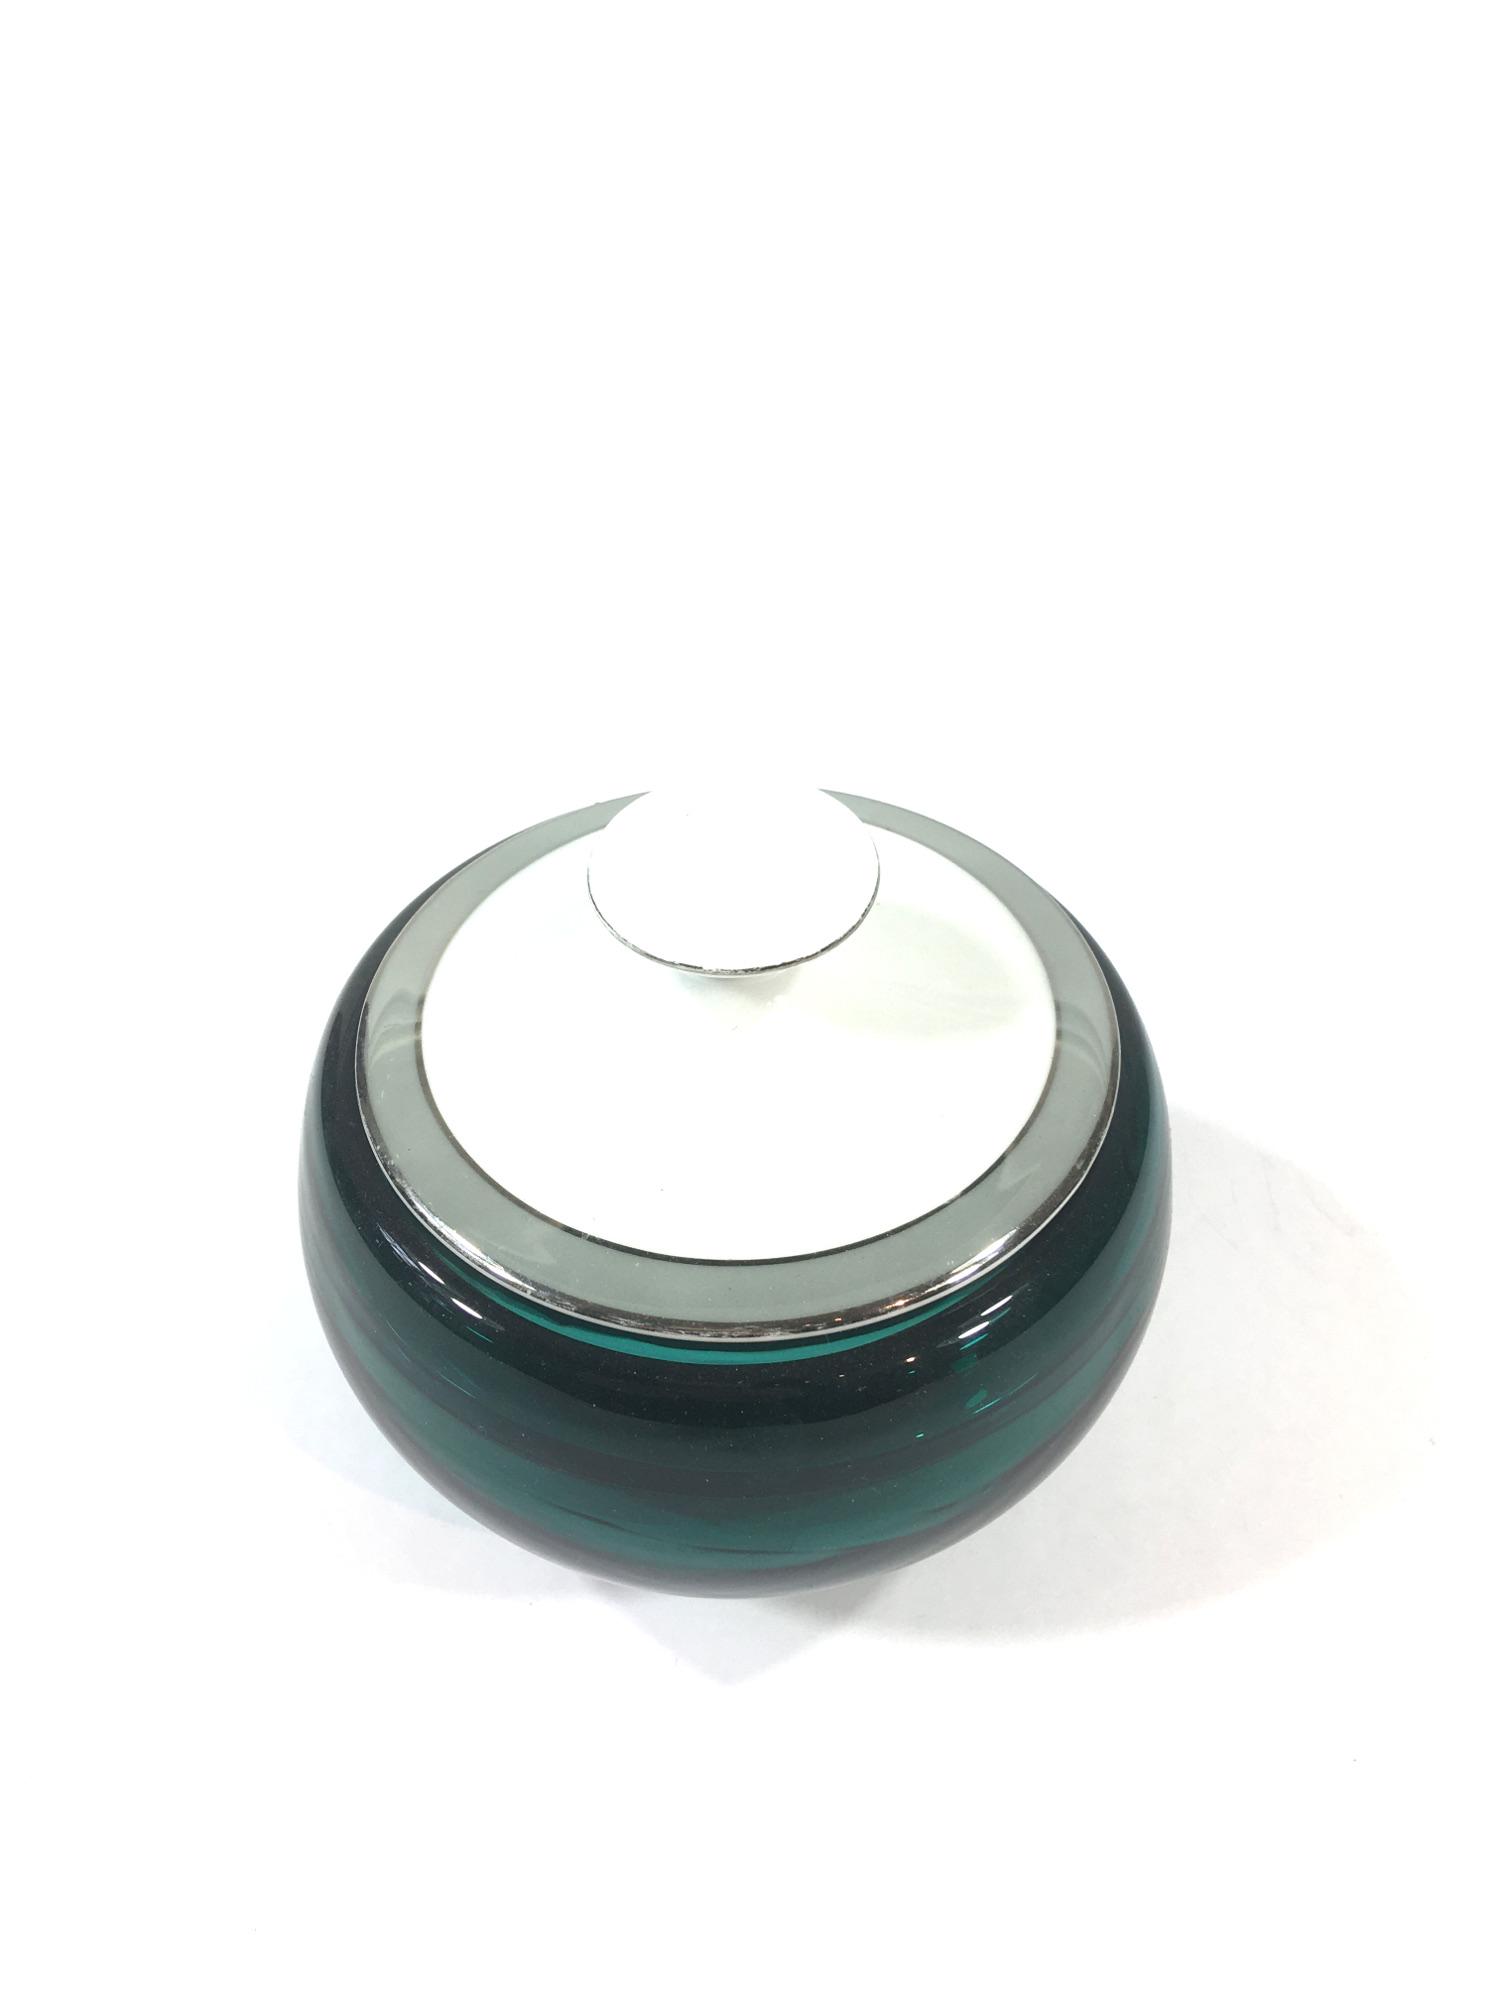 Glasdose mit Porzellandeckel Mint Bild 2